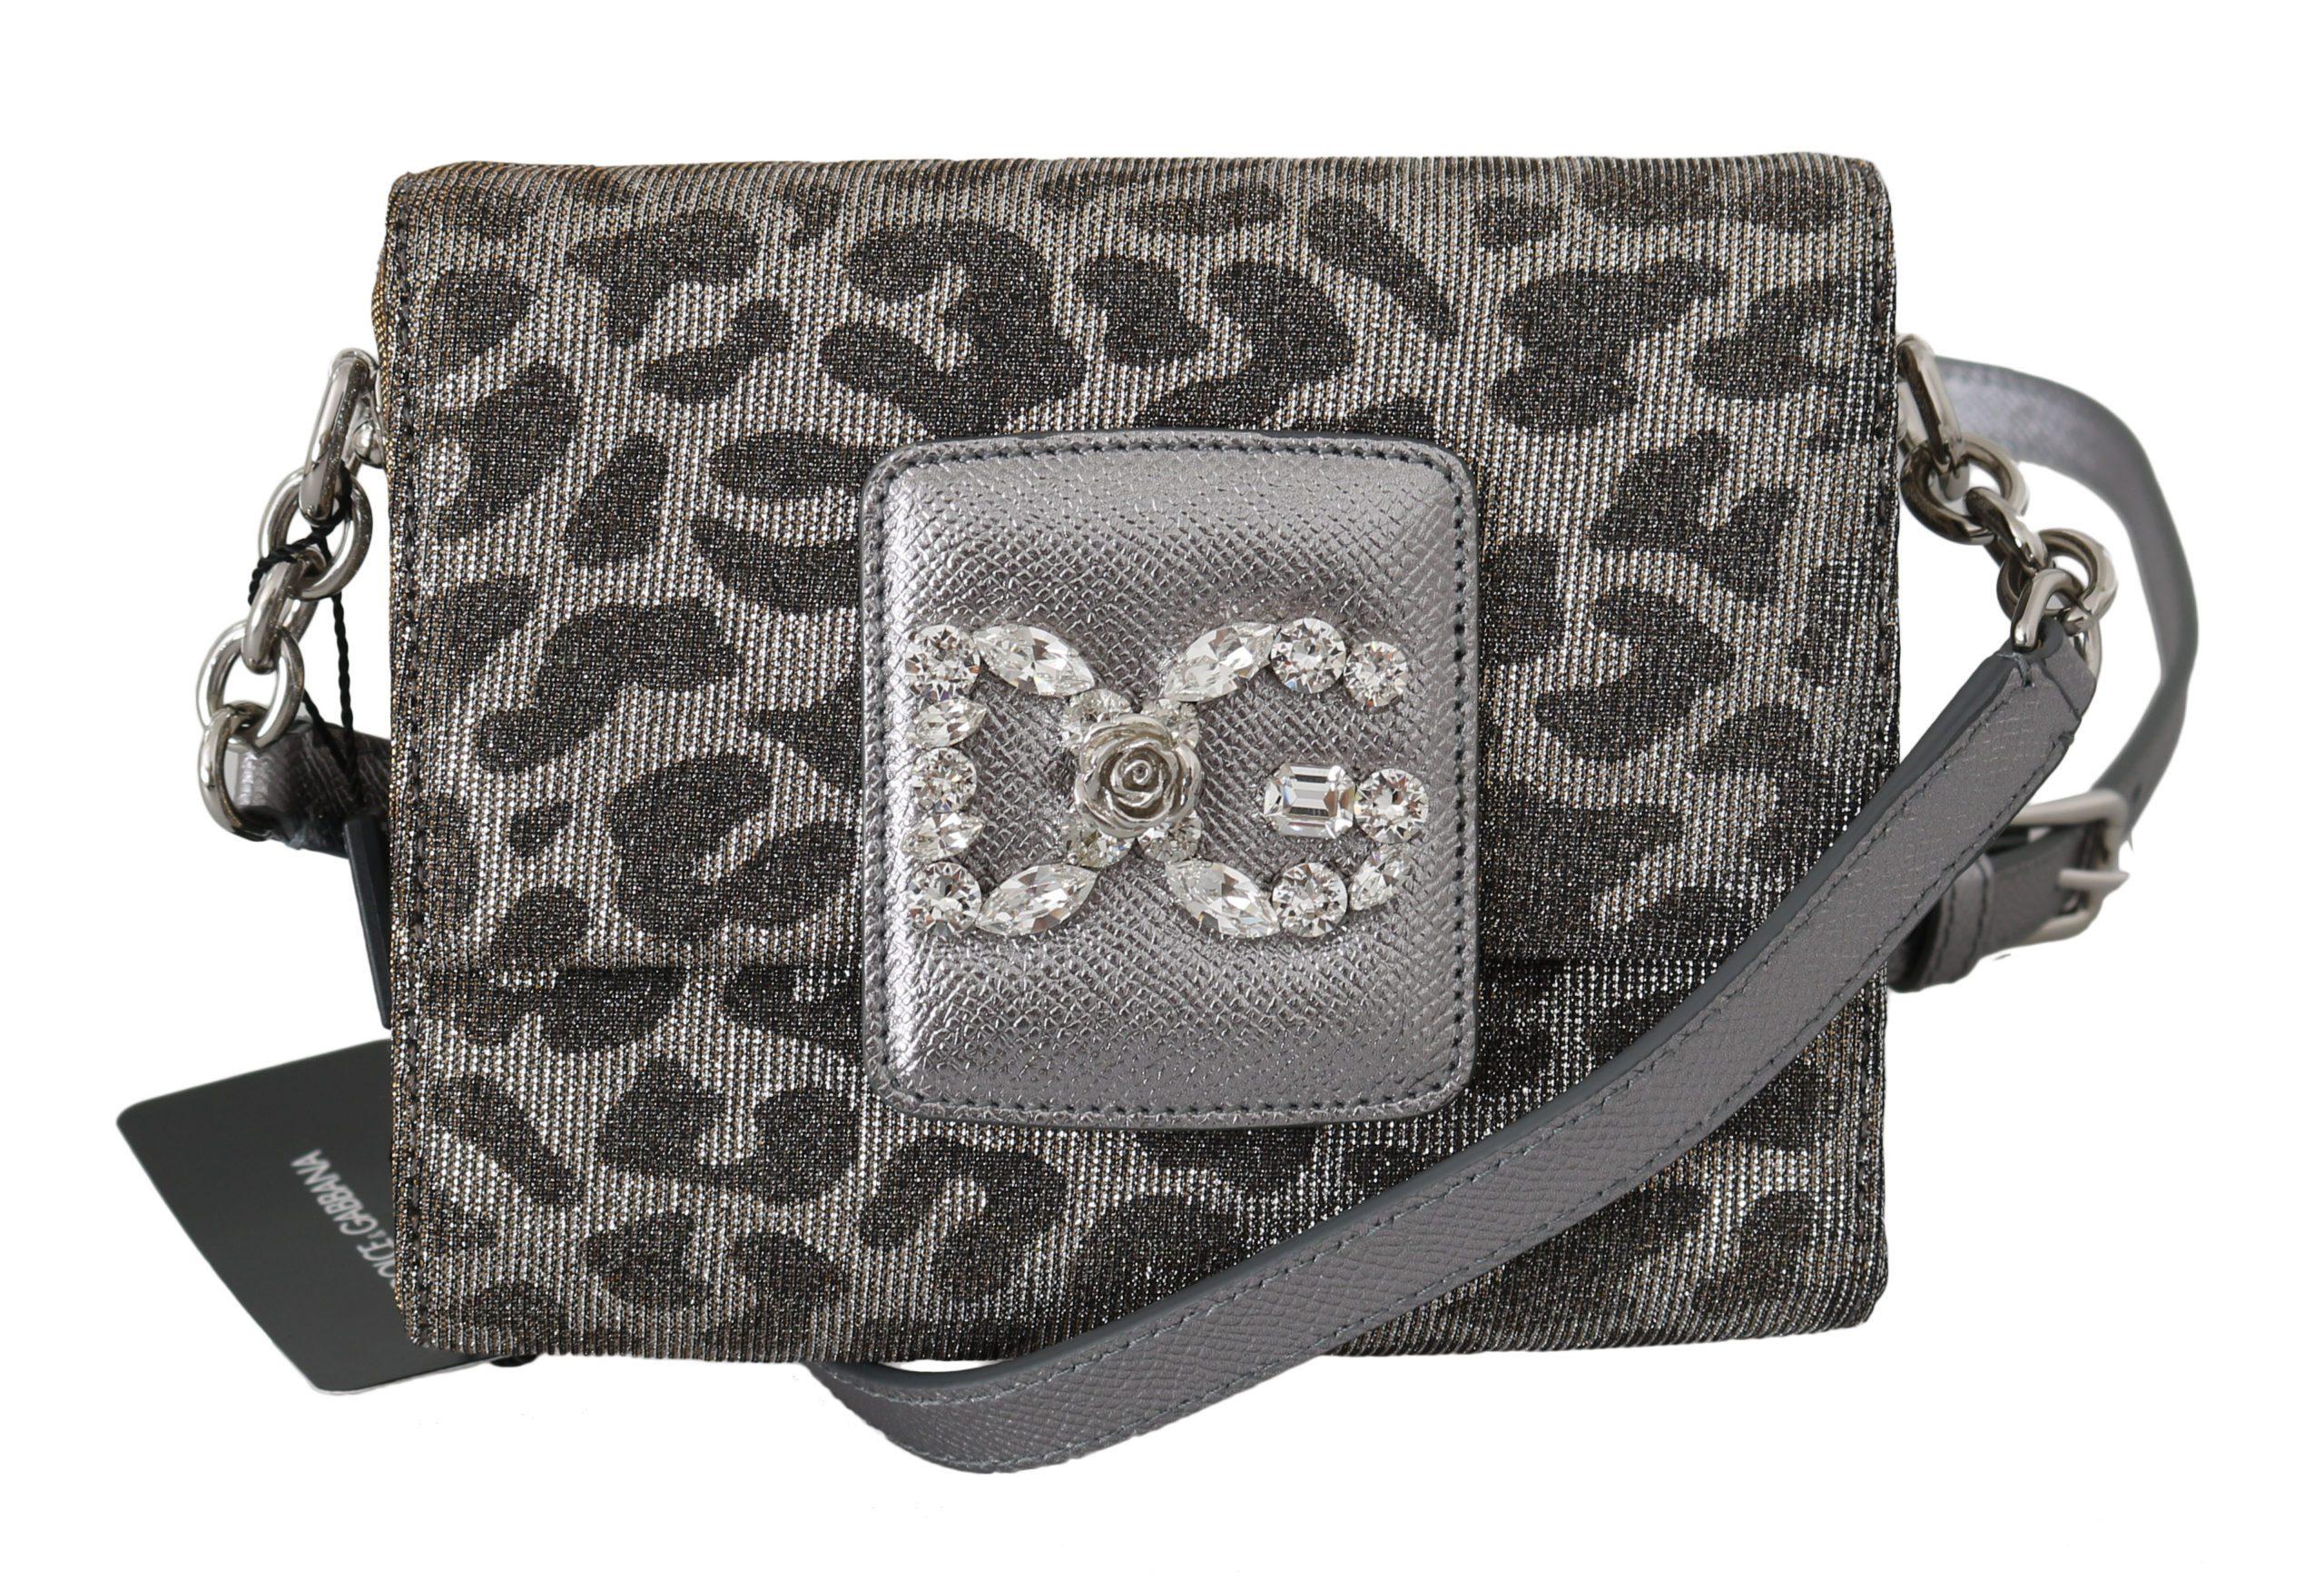 Dolce & Gabbana Women's Leopard Mini Crystal Crossbody Bag Gray VAS8785